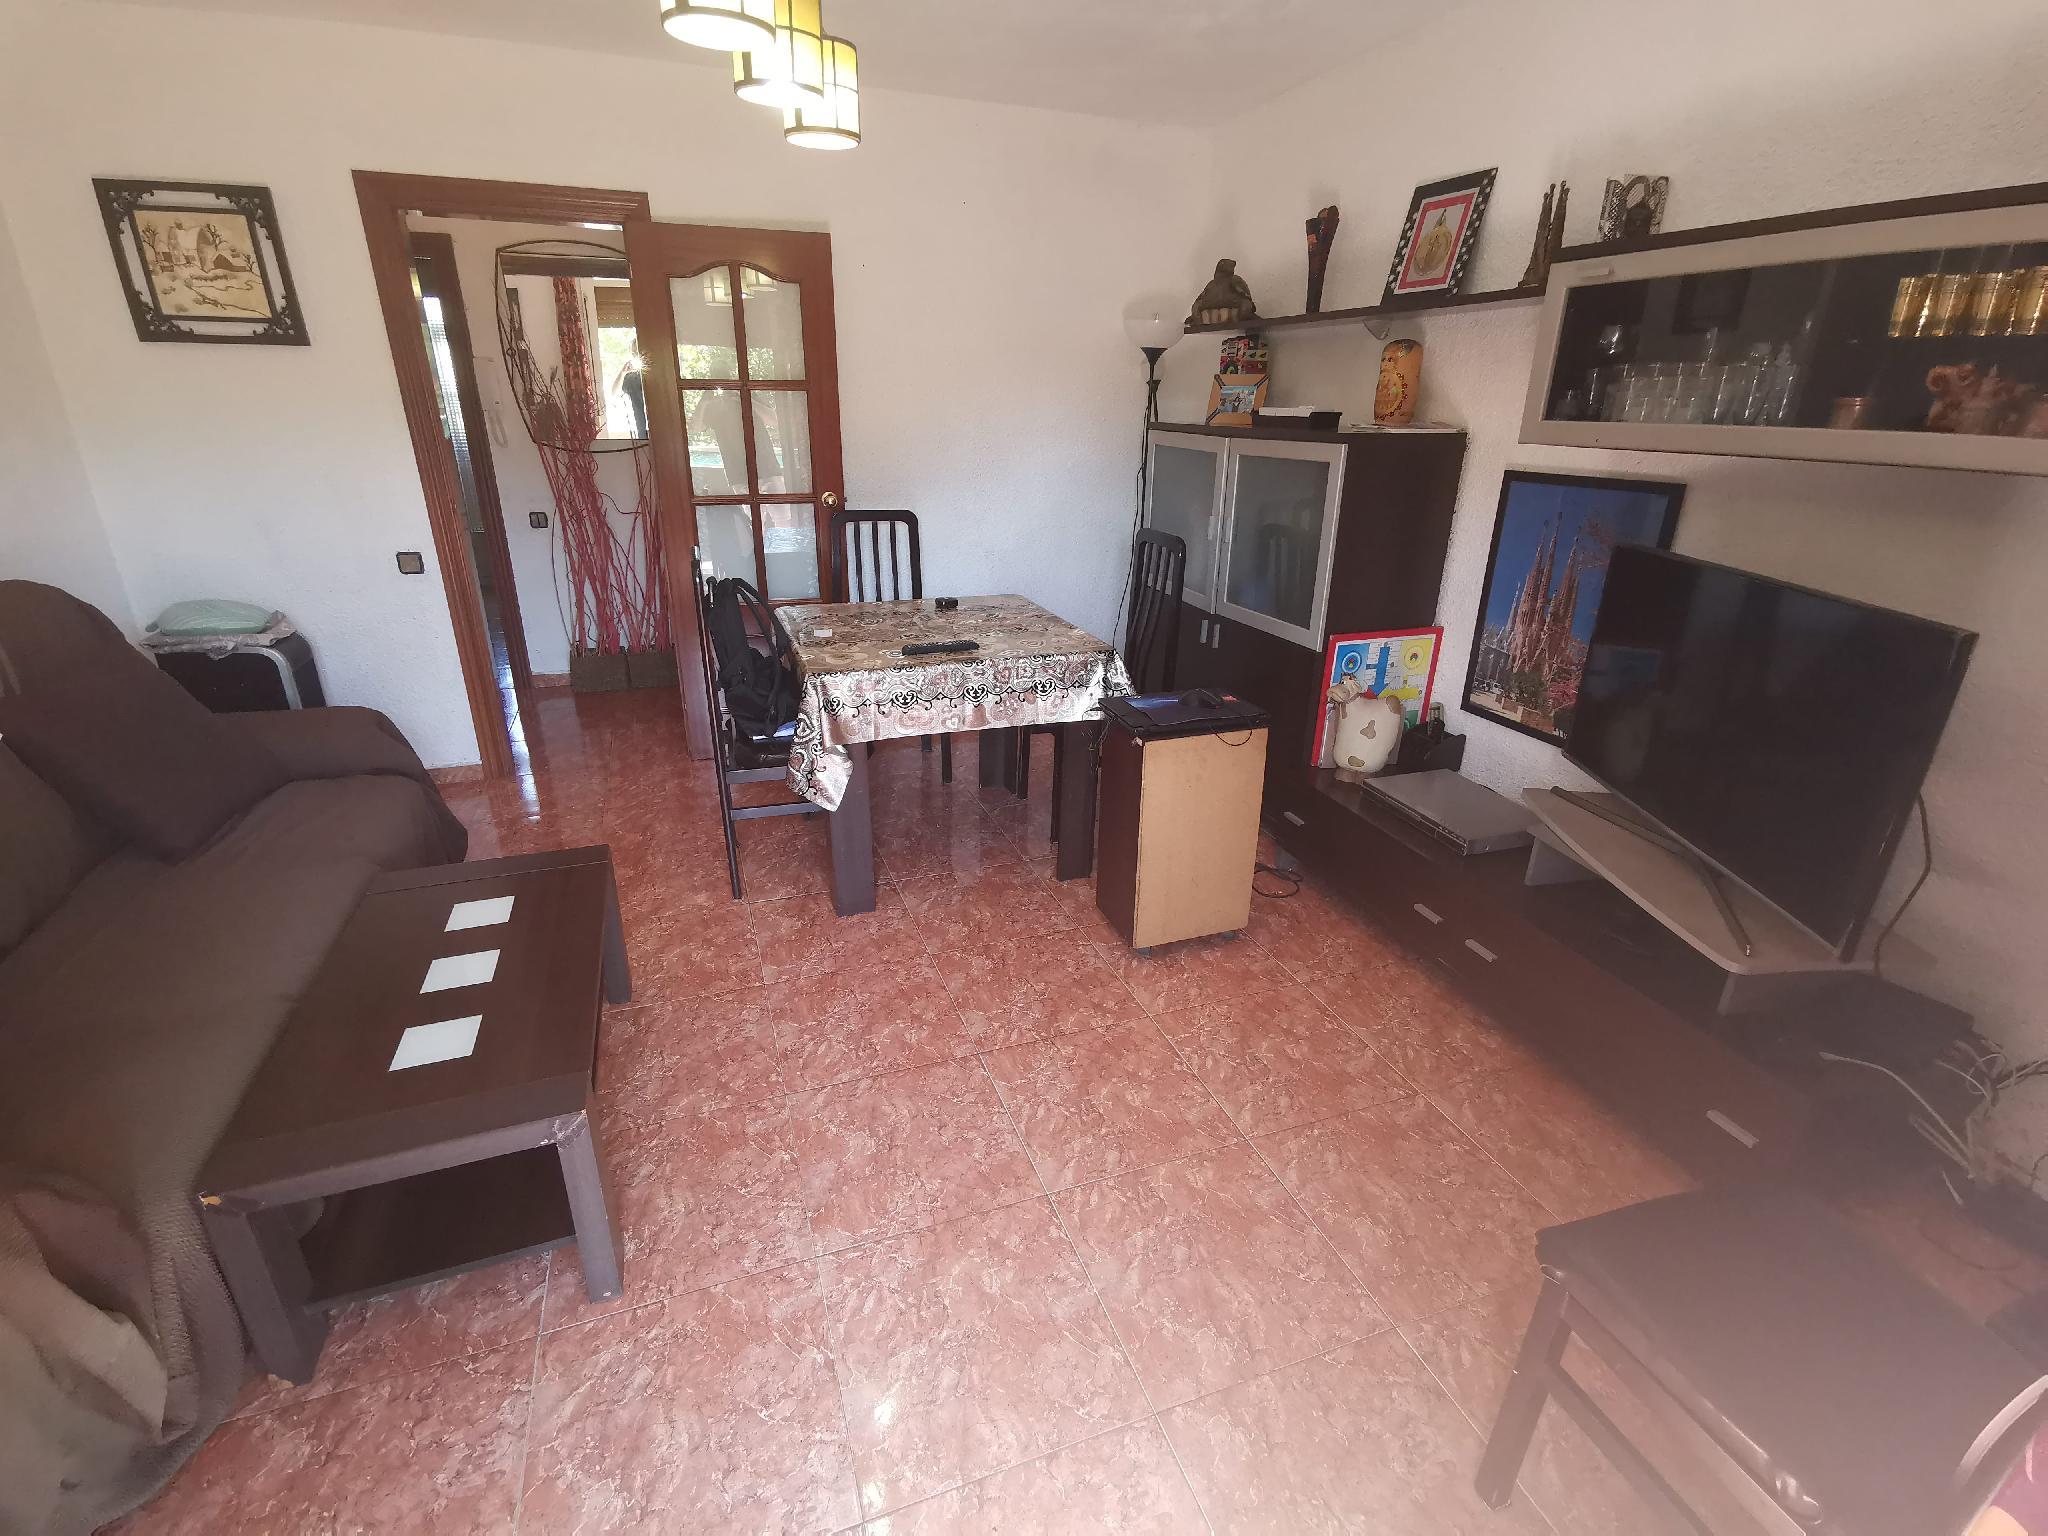 228006 - Sant Roc - Badalona